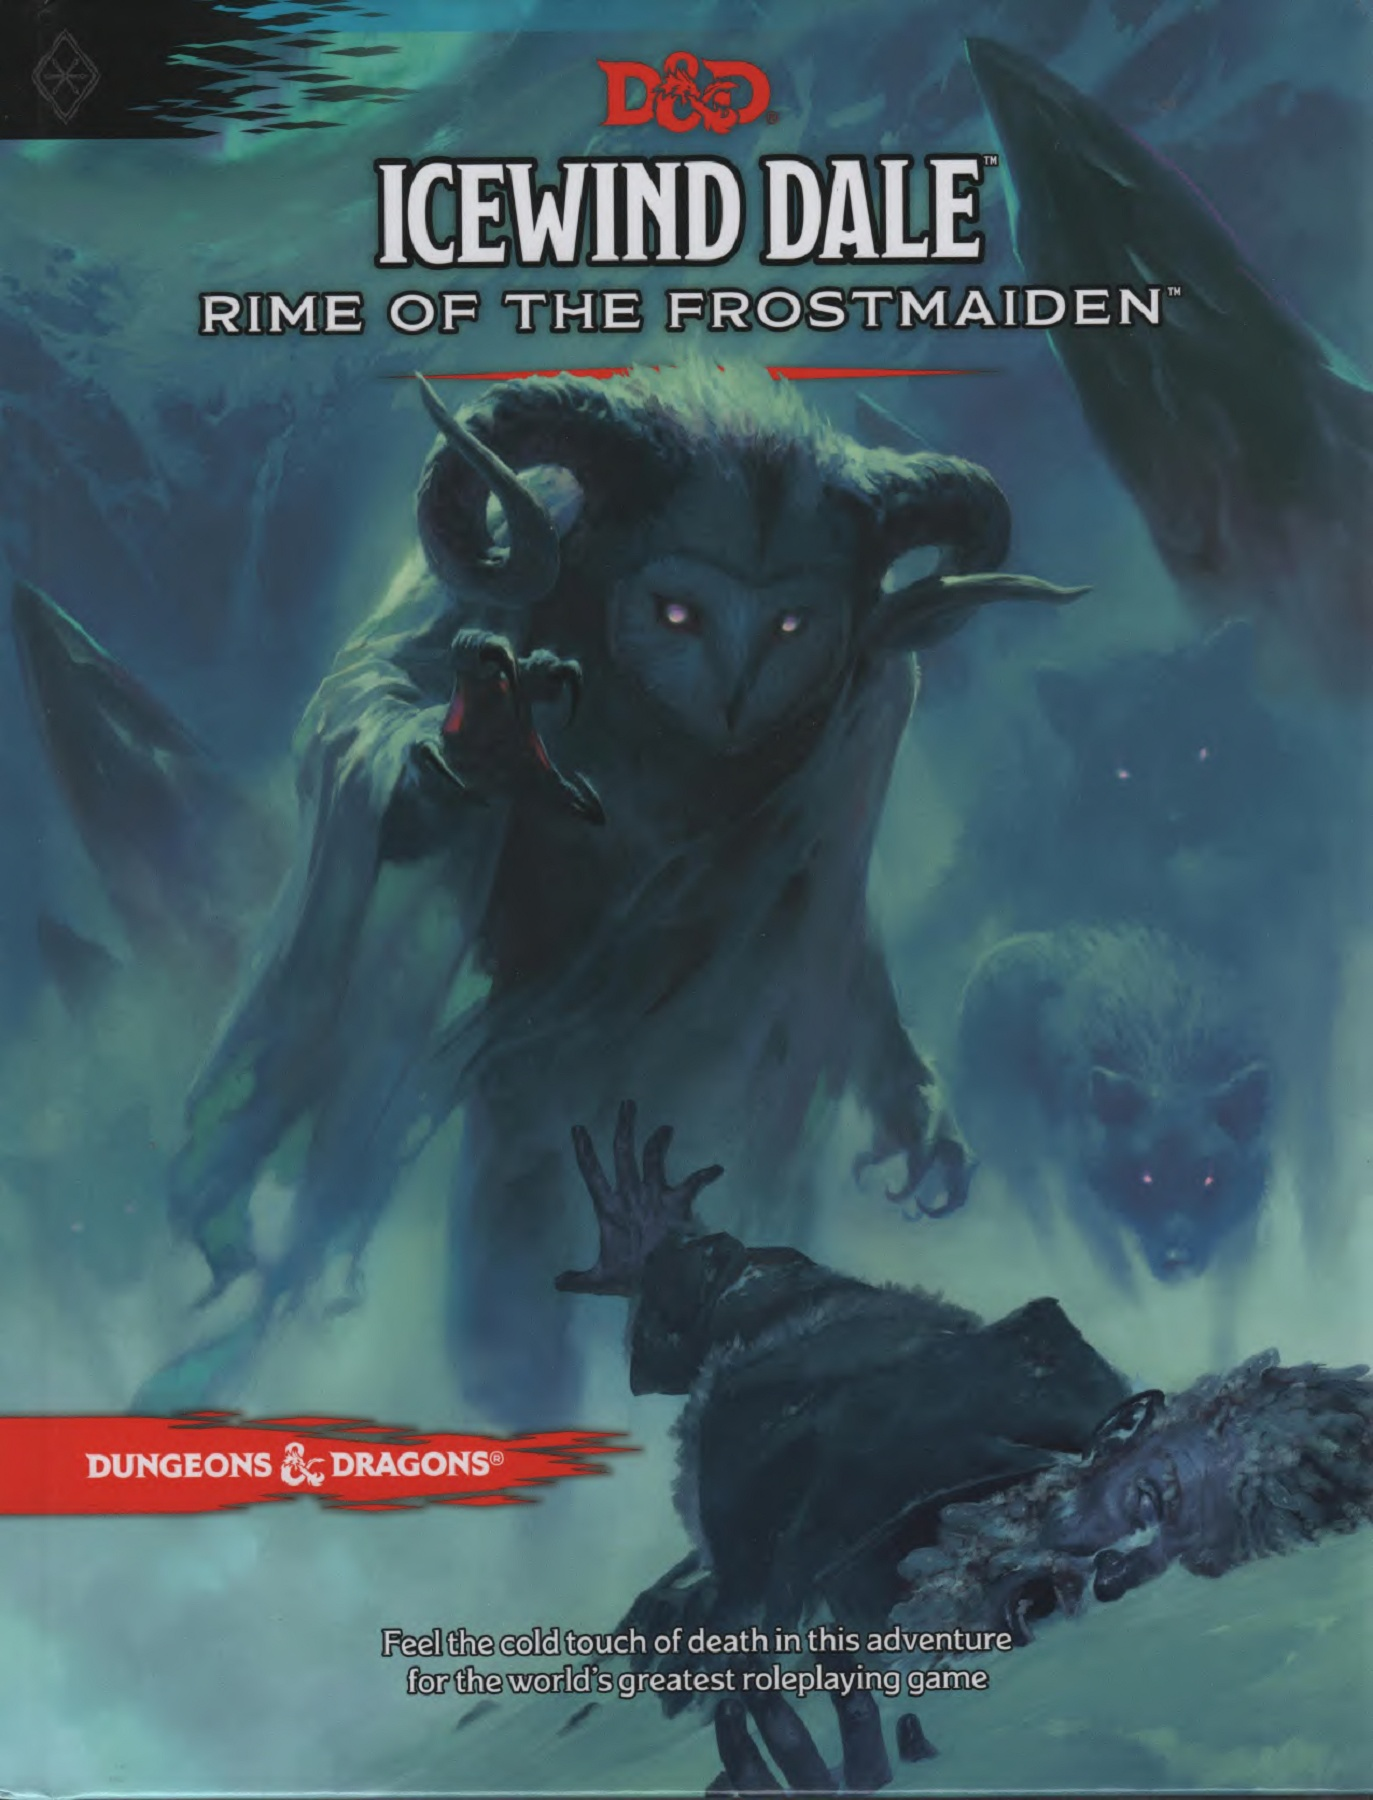 Icewind Dale Dnd 5e : icewind, Icewind, Dale:, Frostmaiden